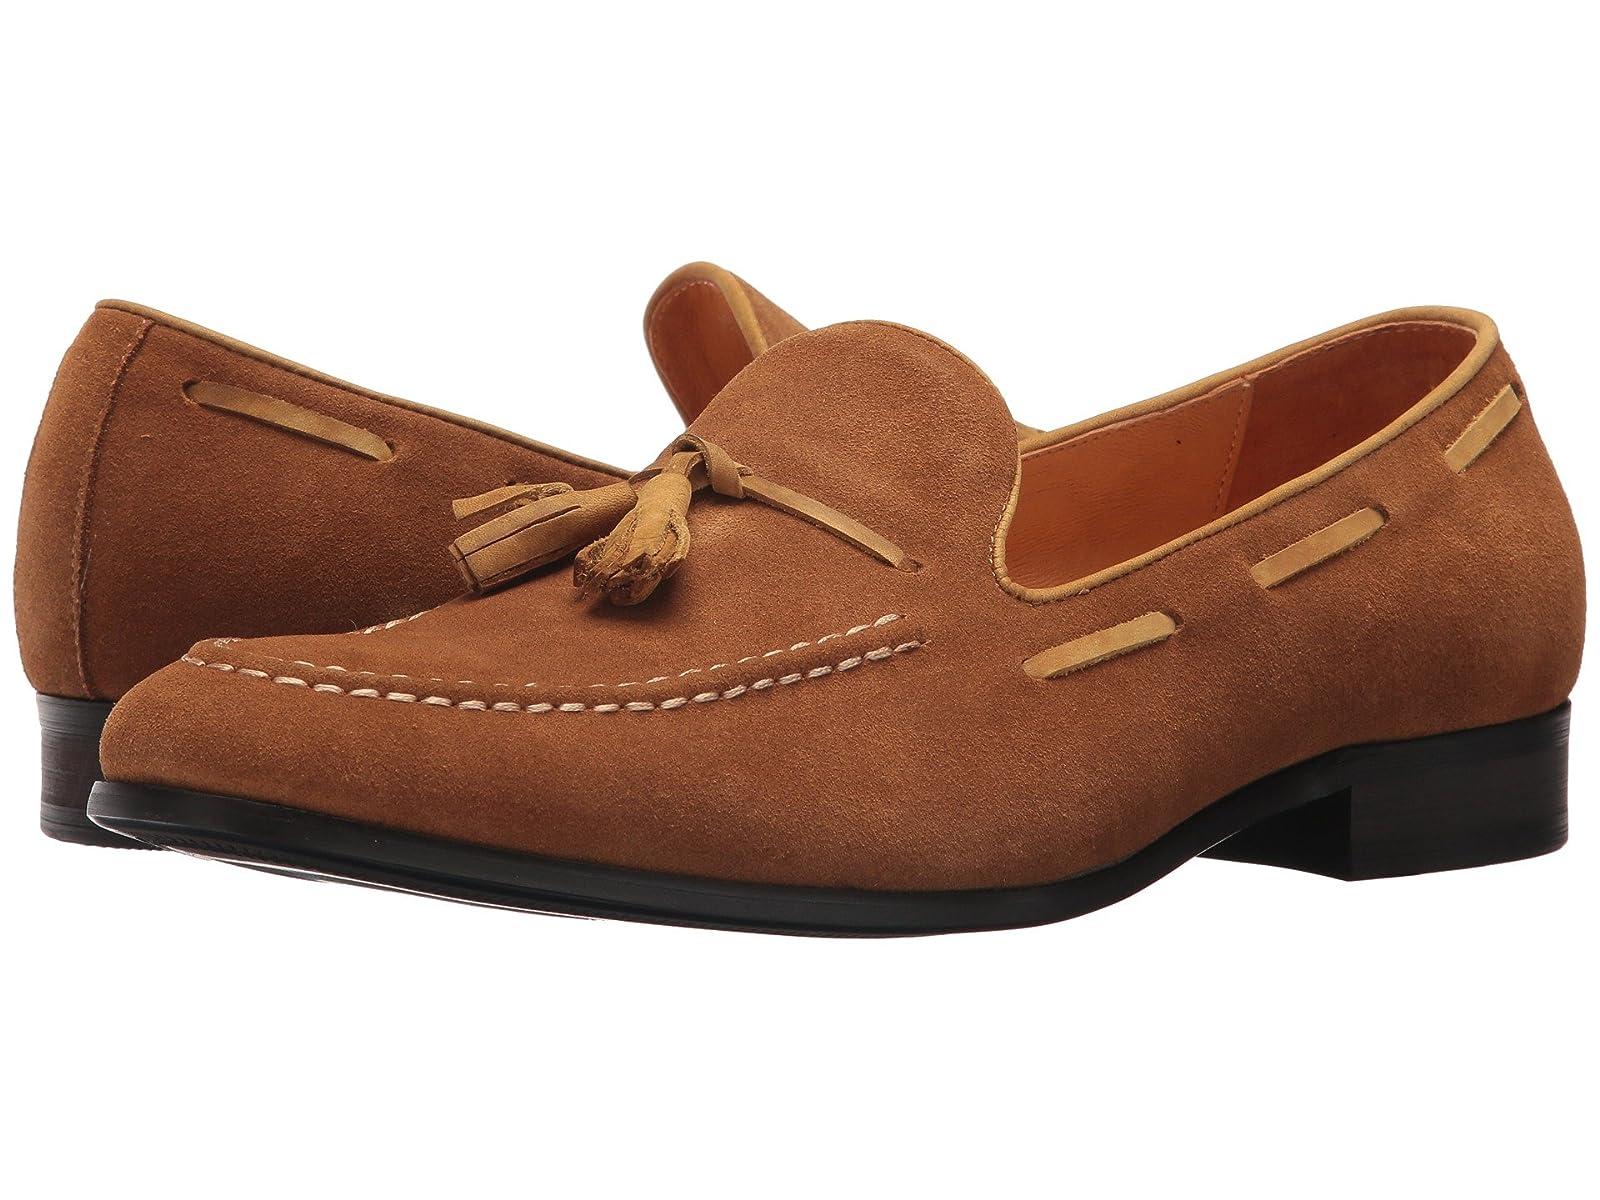 Carrucci RichardAtmospheric grades have affordable shoes